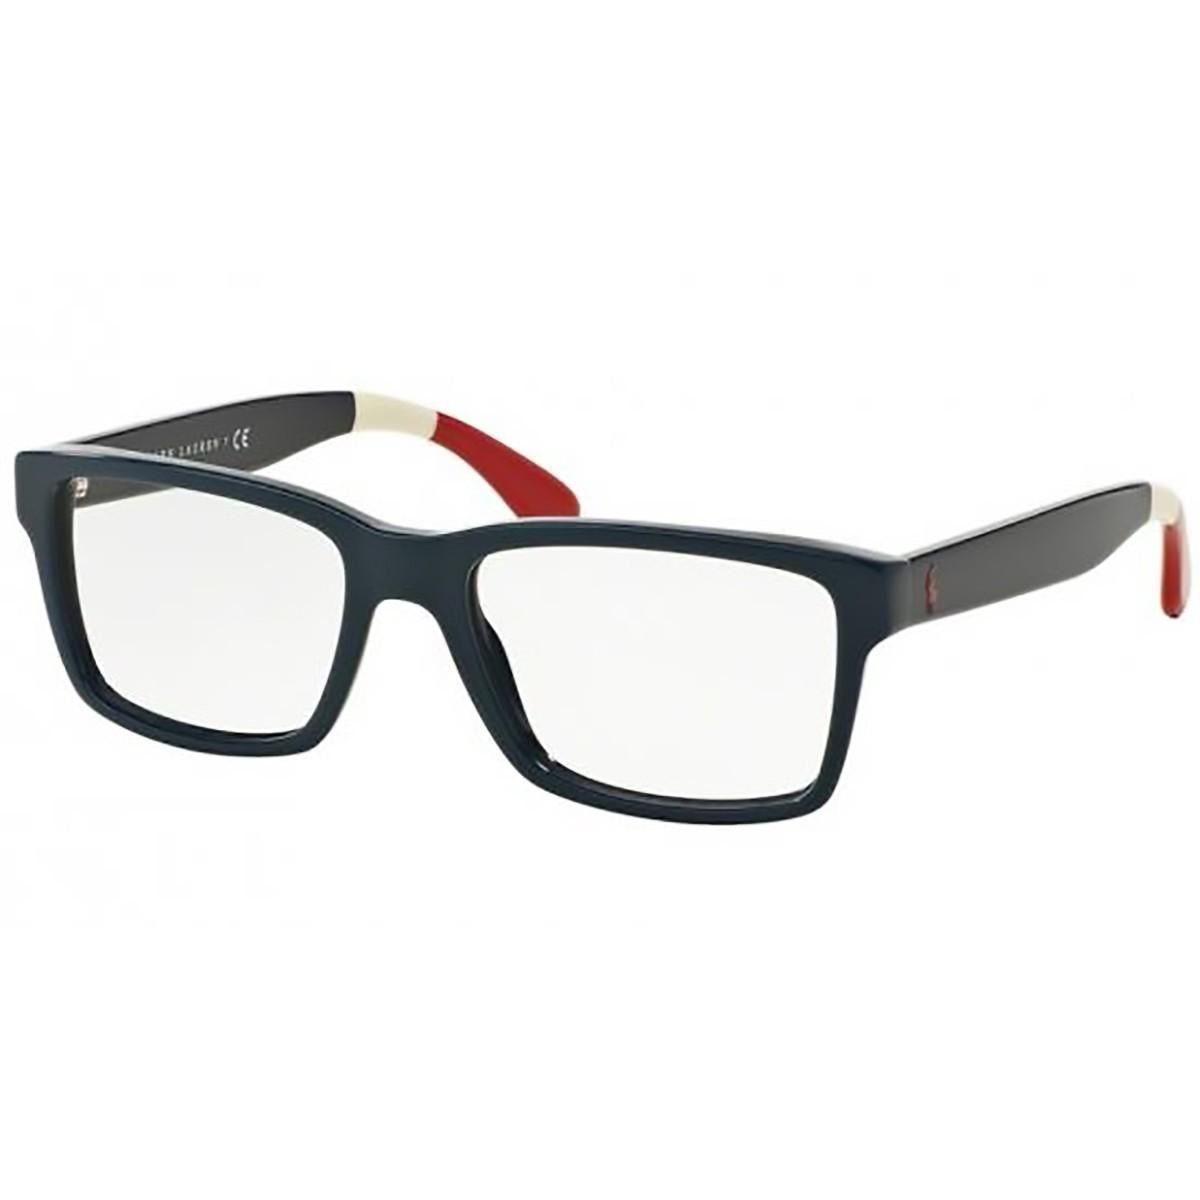 71647ddd9aabf Compre Óculos de Grau Polo Ralph Lauren em 10X   Tri-Jóia Shop